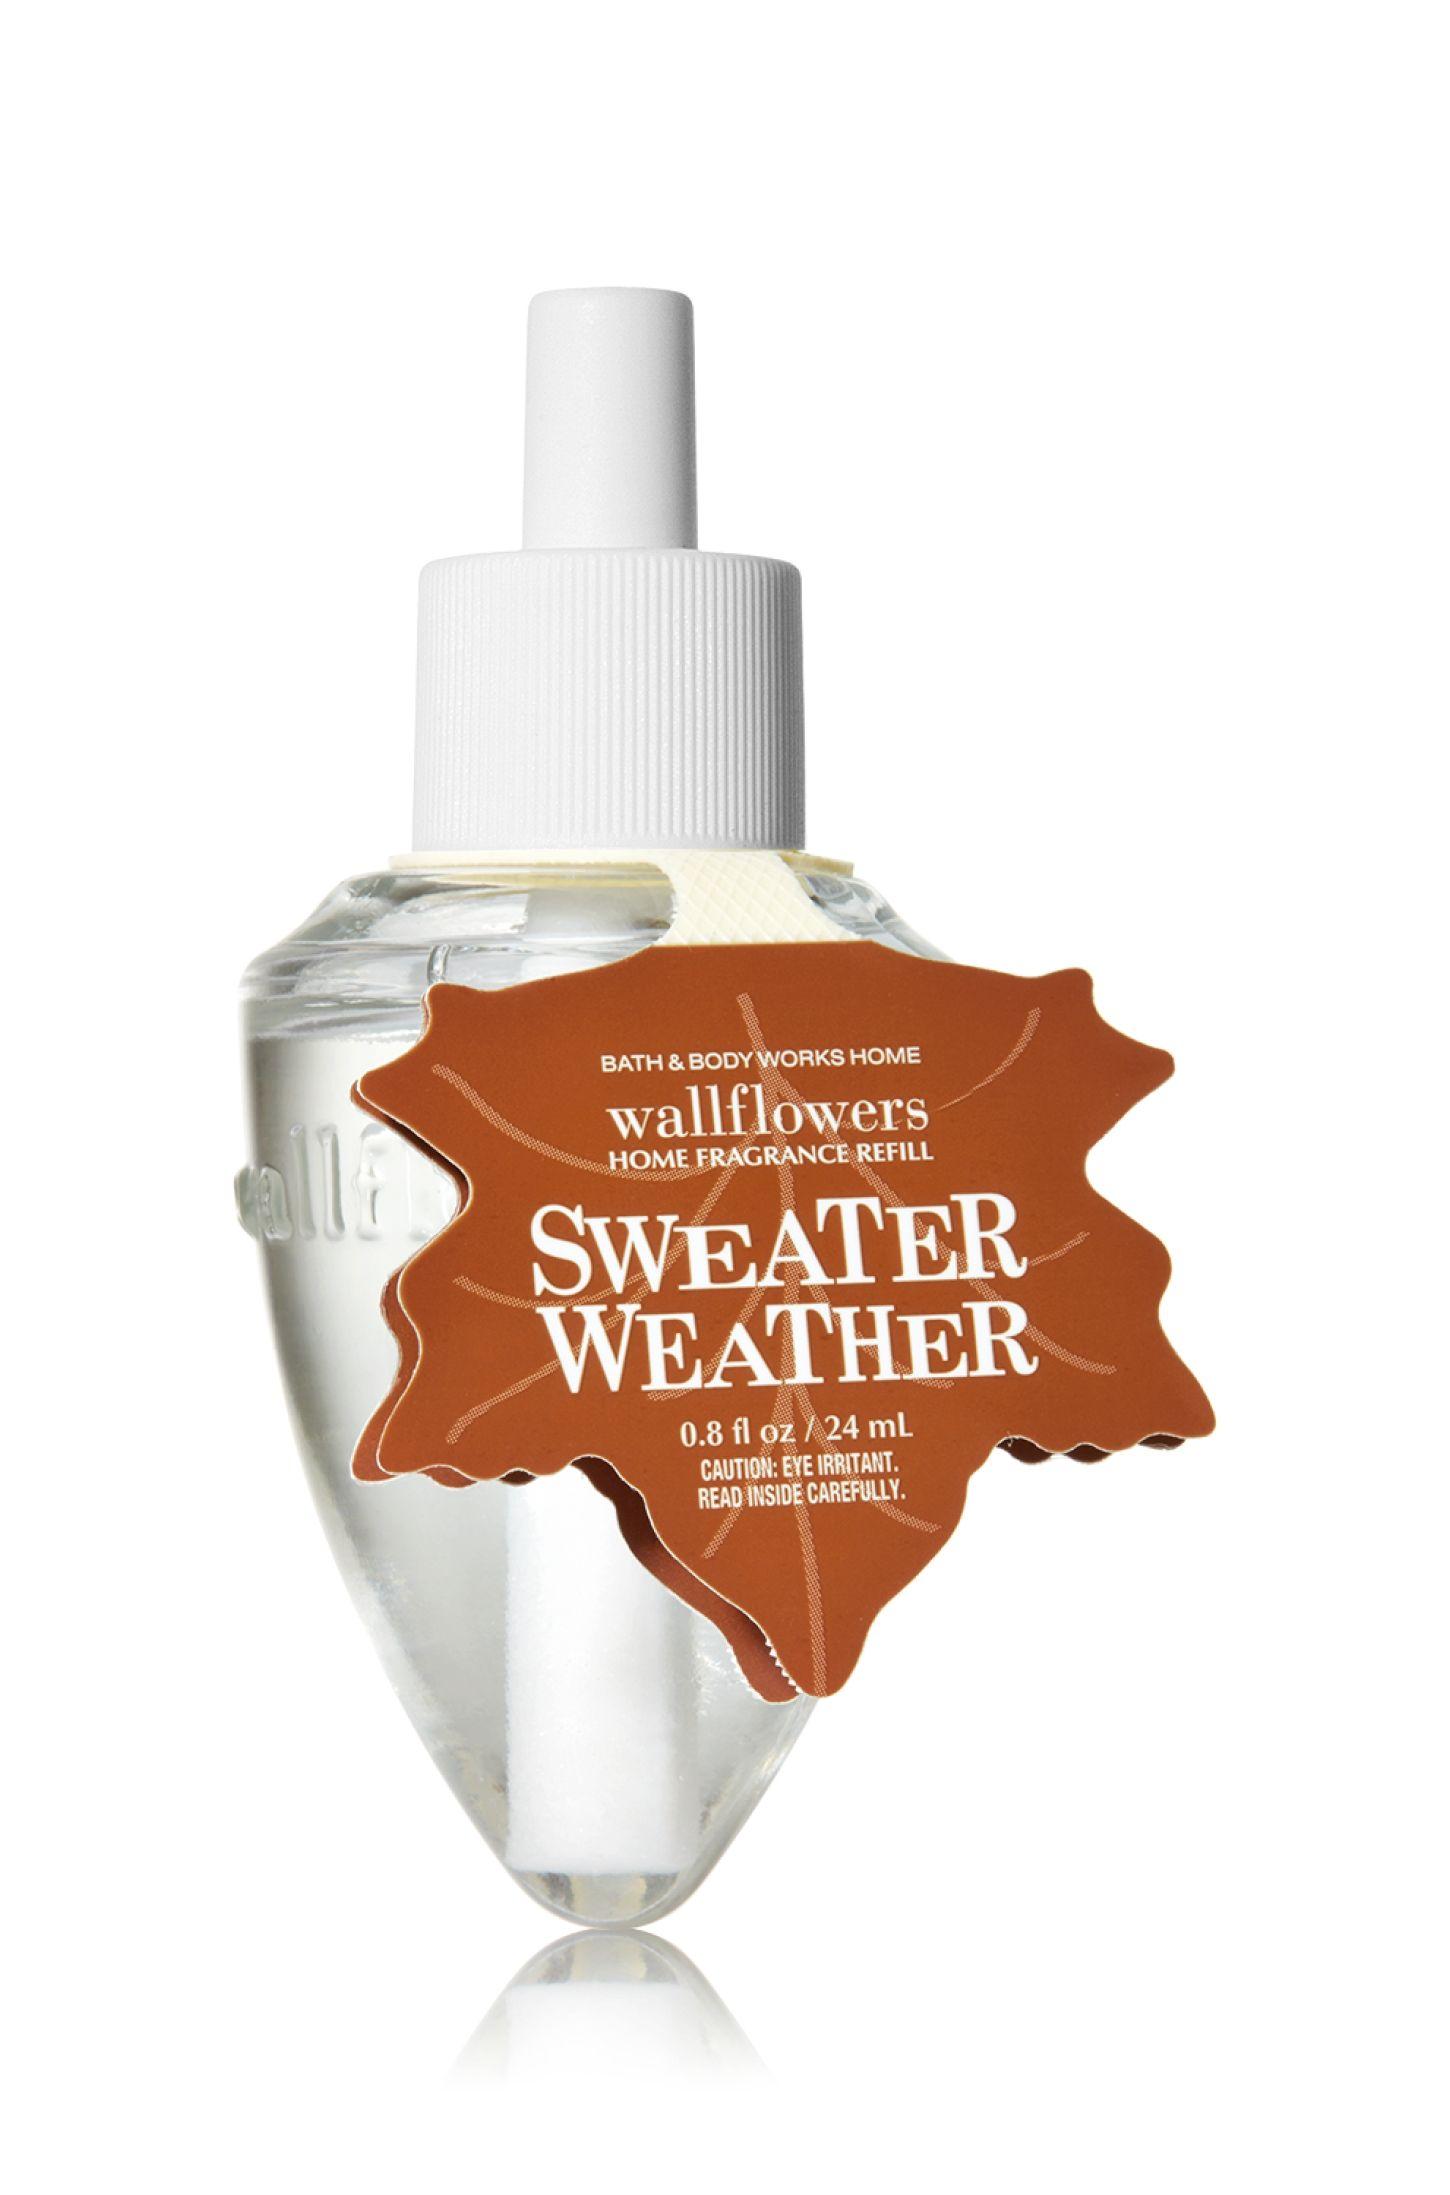 Sweater Weather Wallflowers Fragrance Refill Home Fragrance Bath